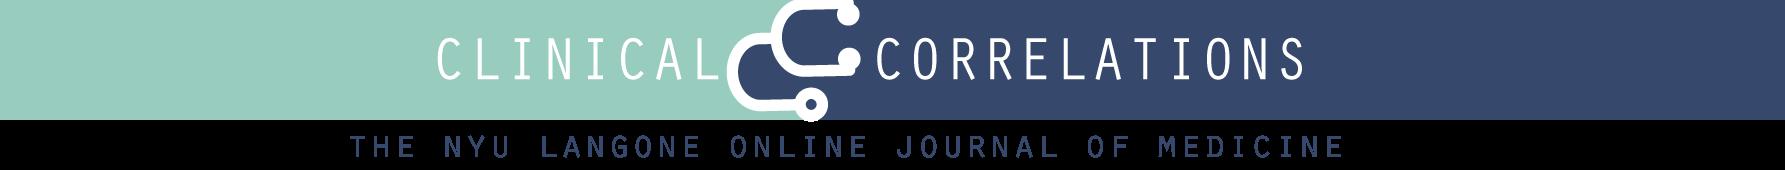 CC_logo_extended